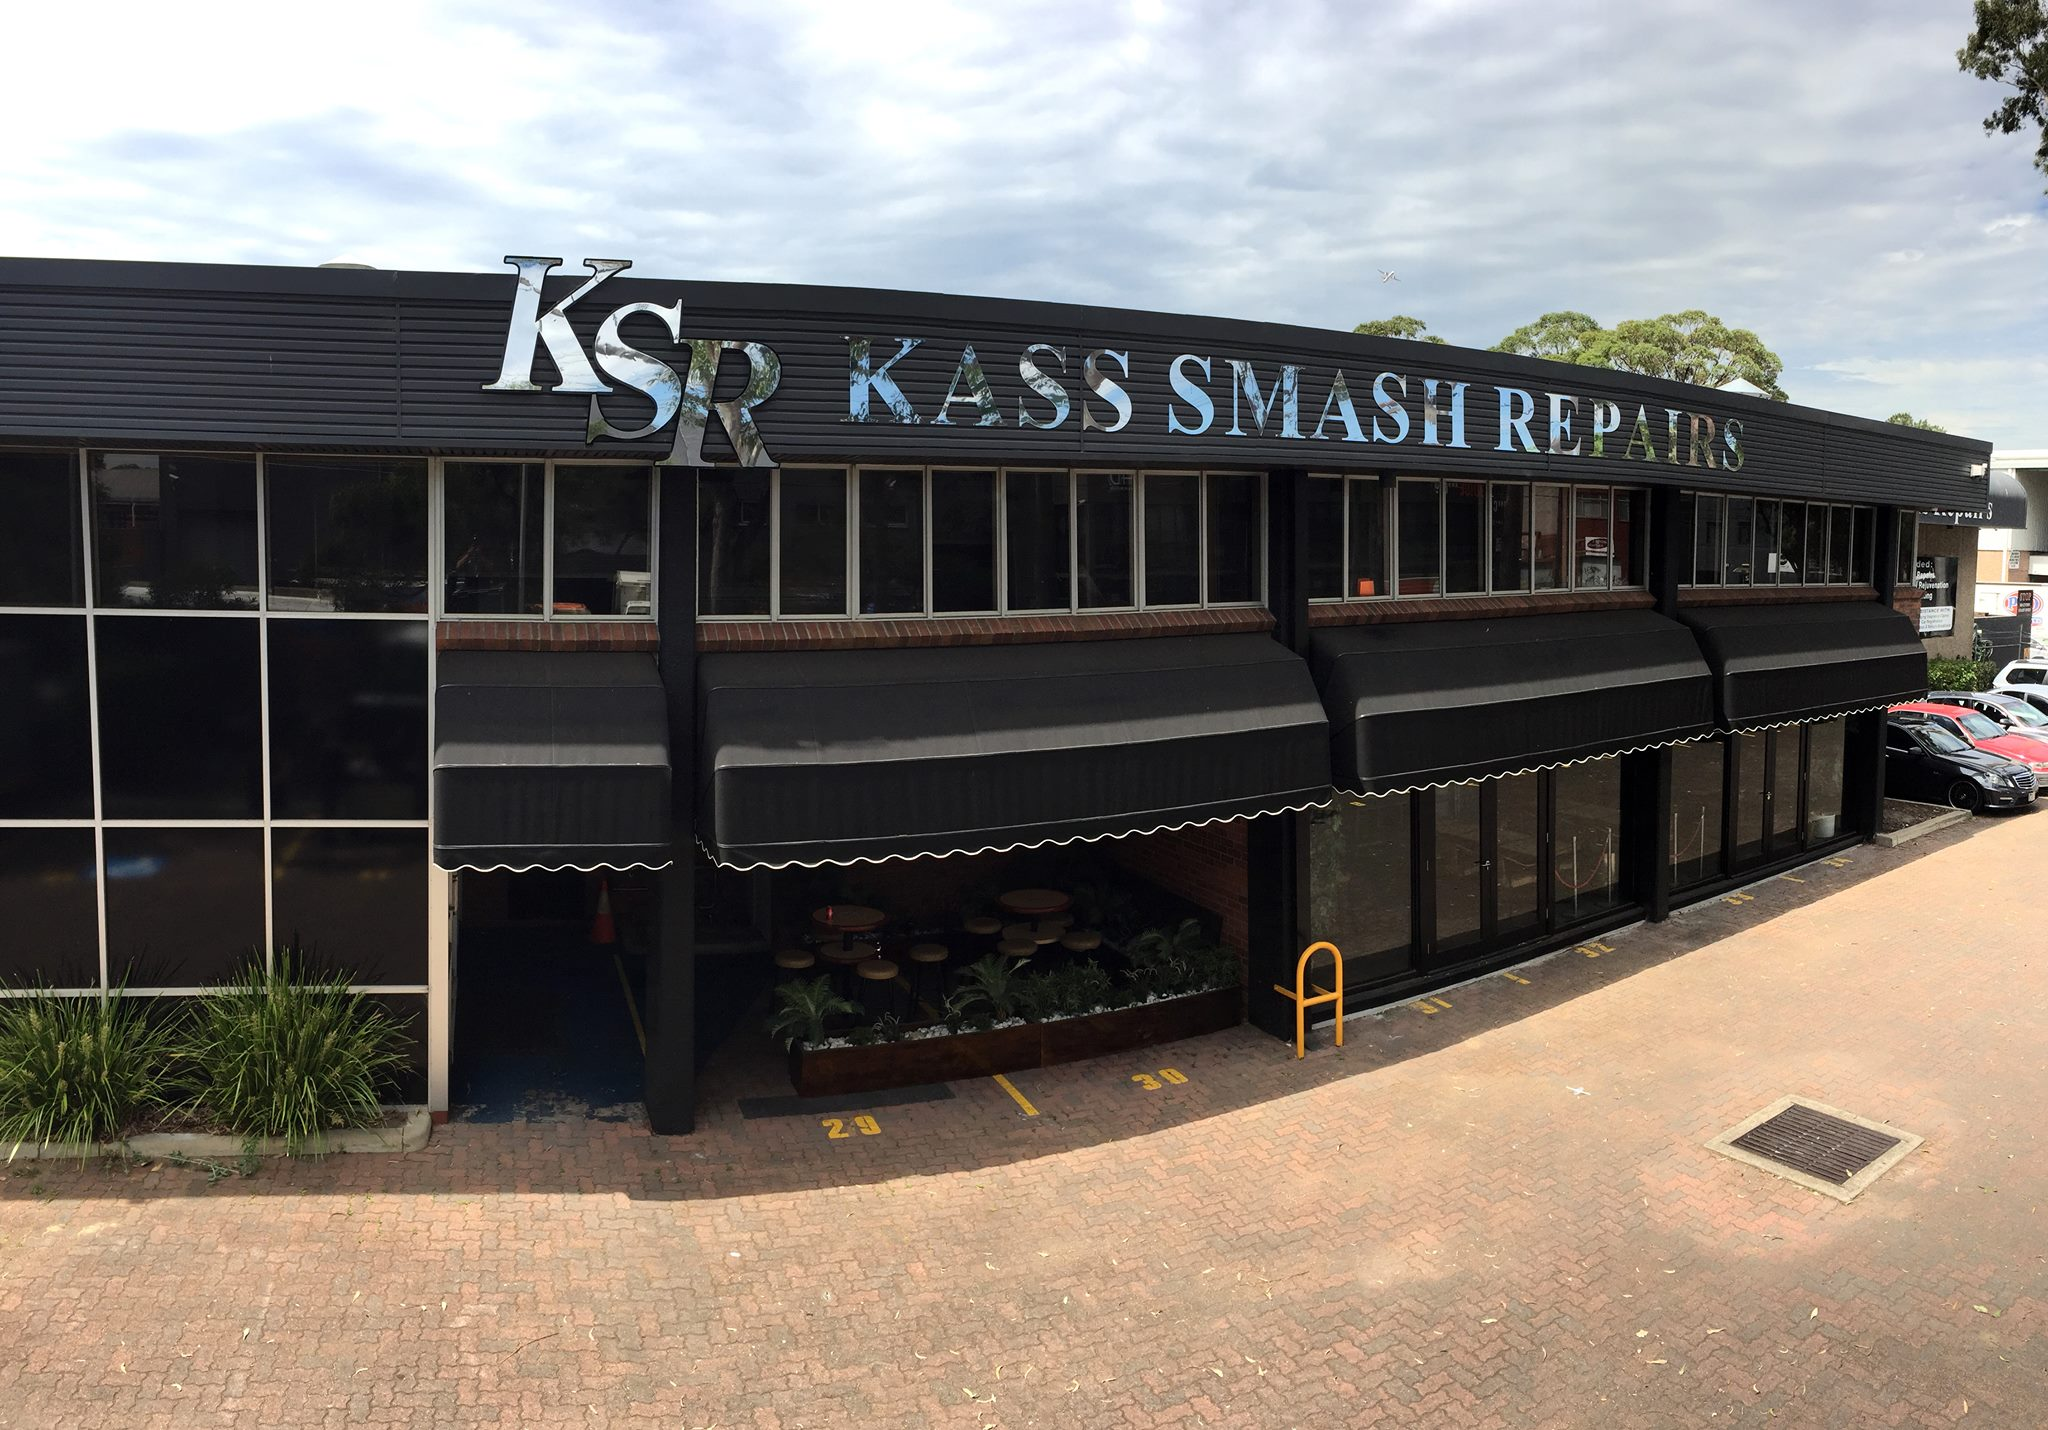 Kass Smash Repairs Photos